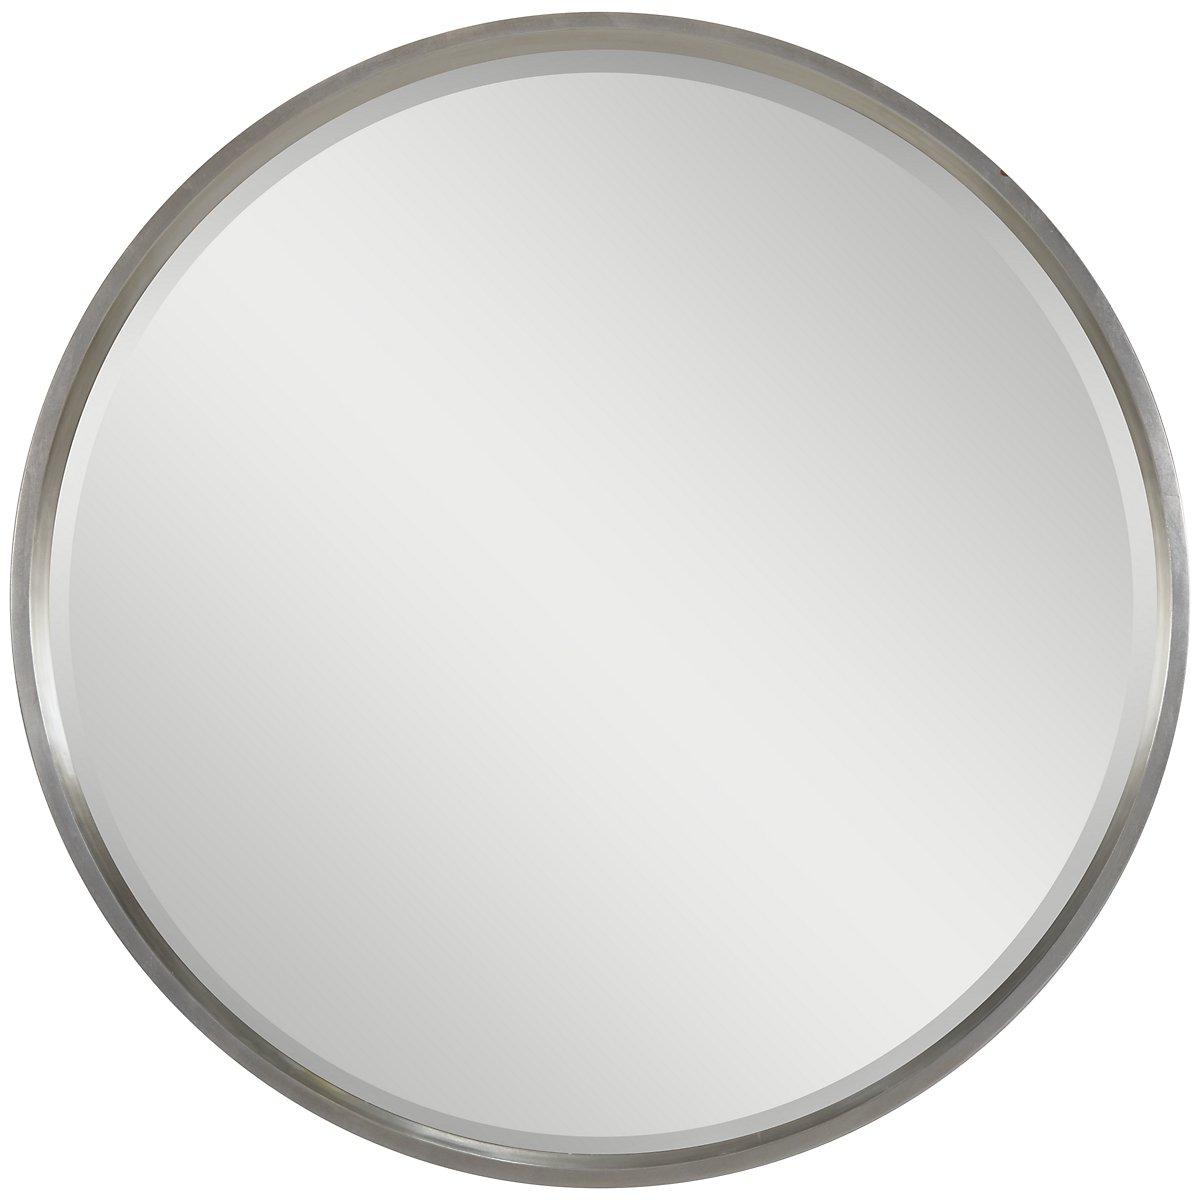 Jonah Silver Mirror